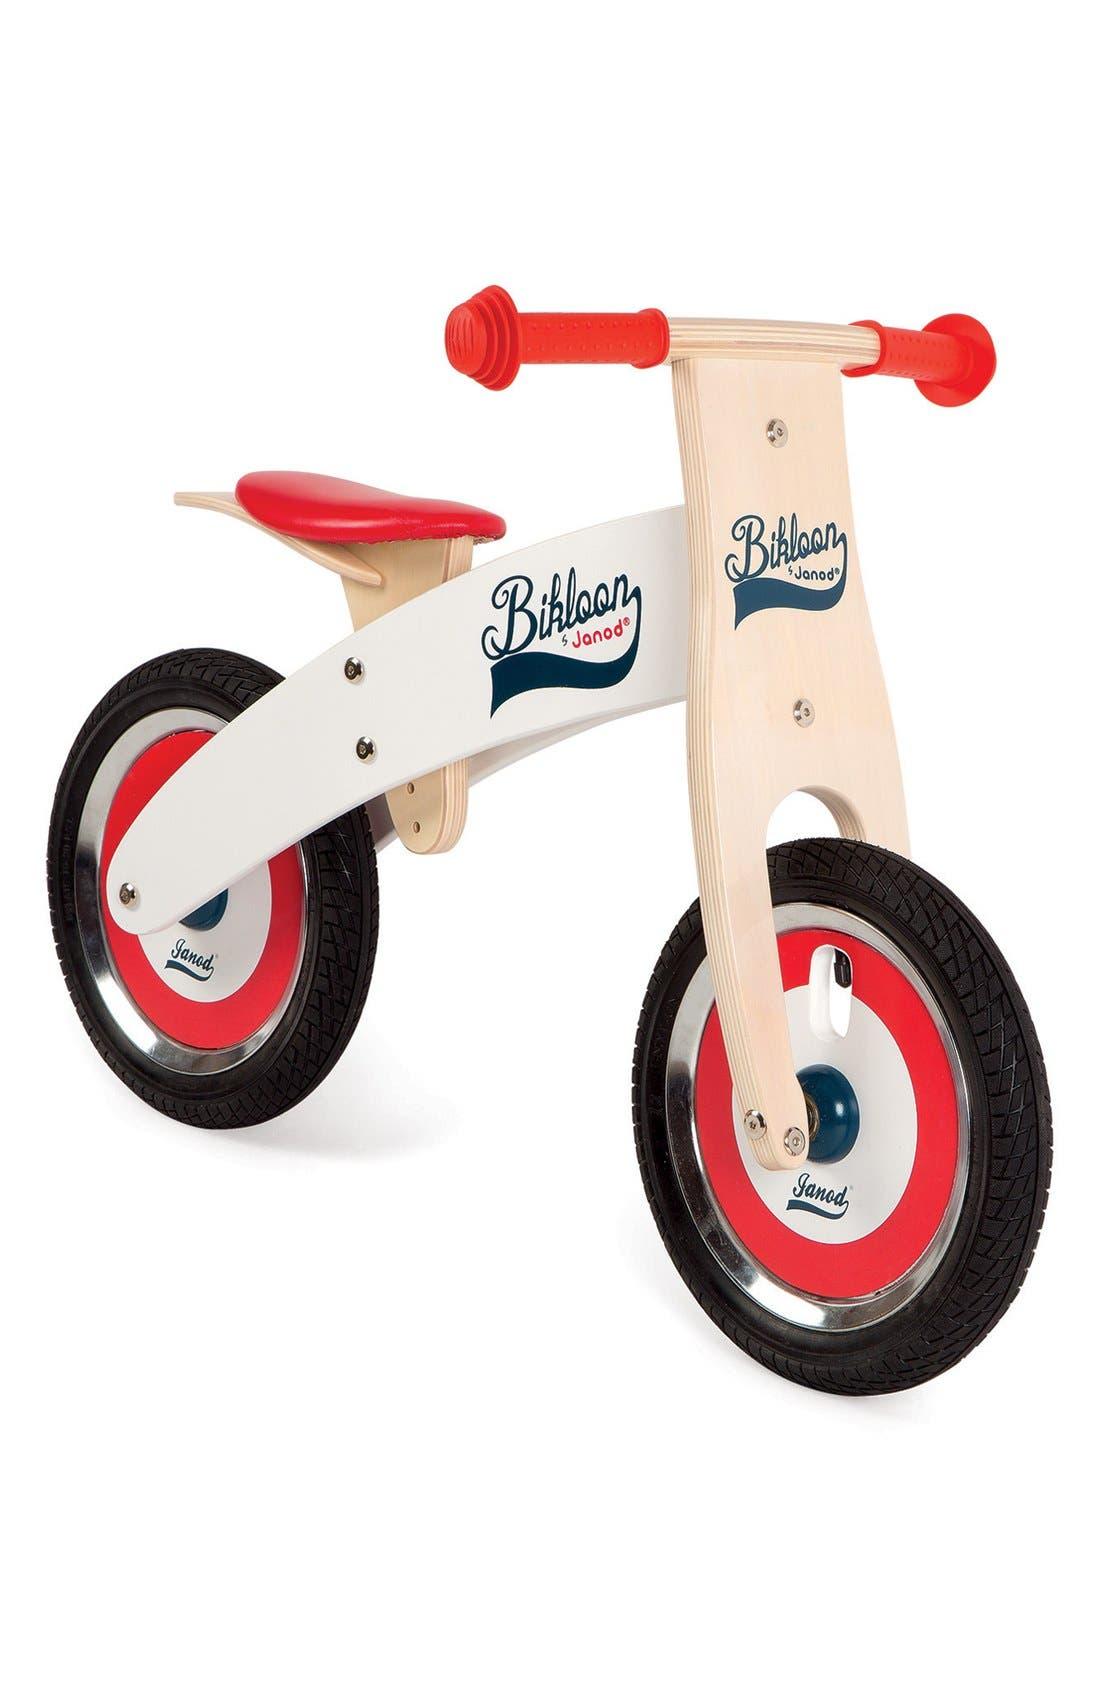 Janod 'Bikloon' Balance Bike (Toddler)